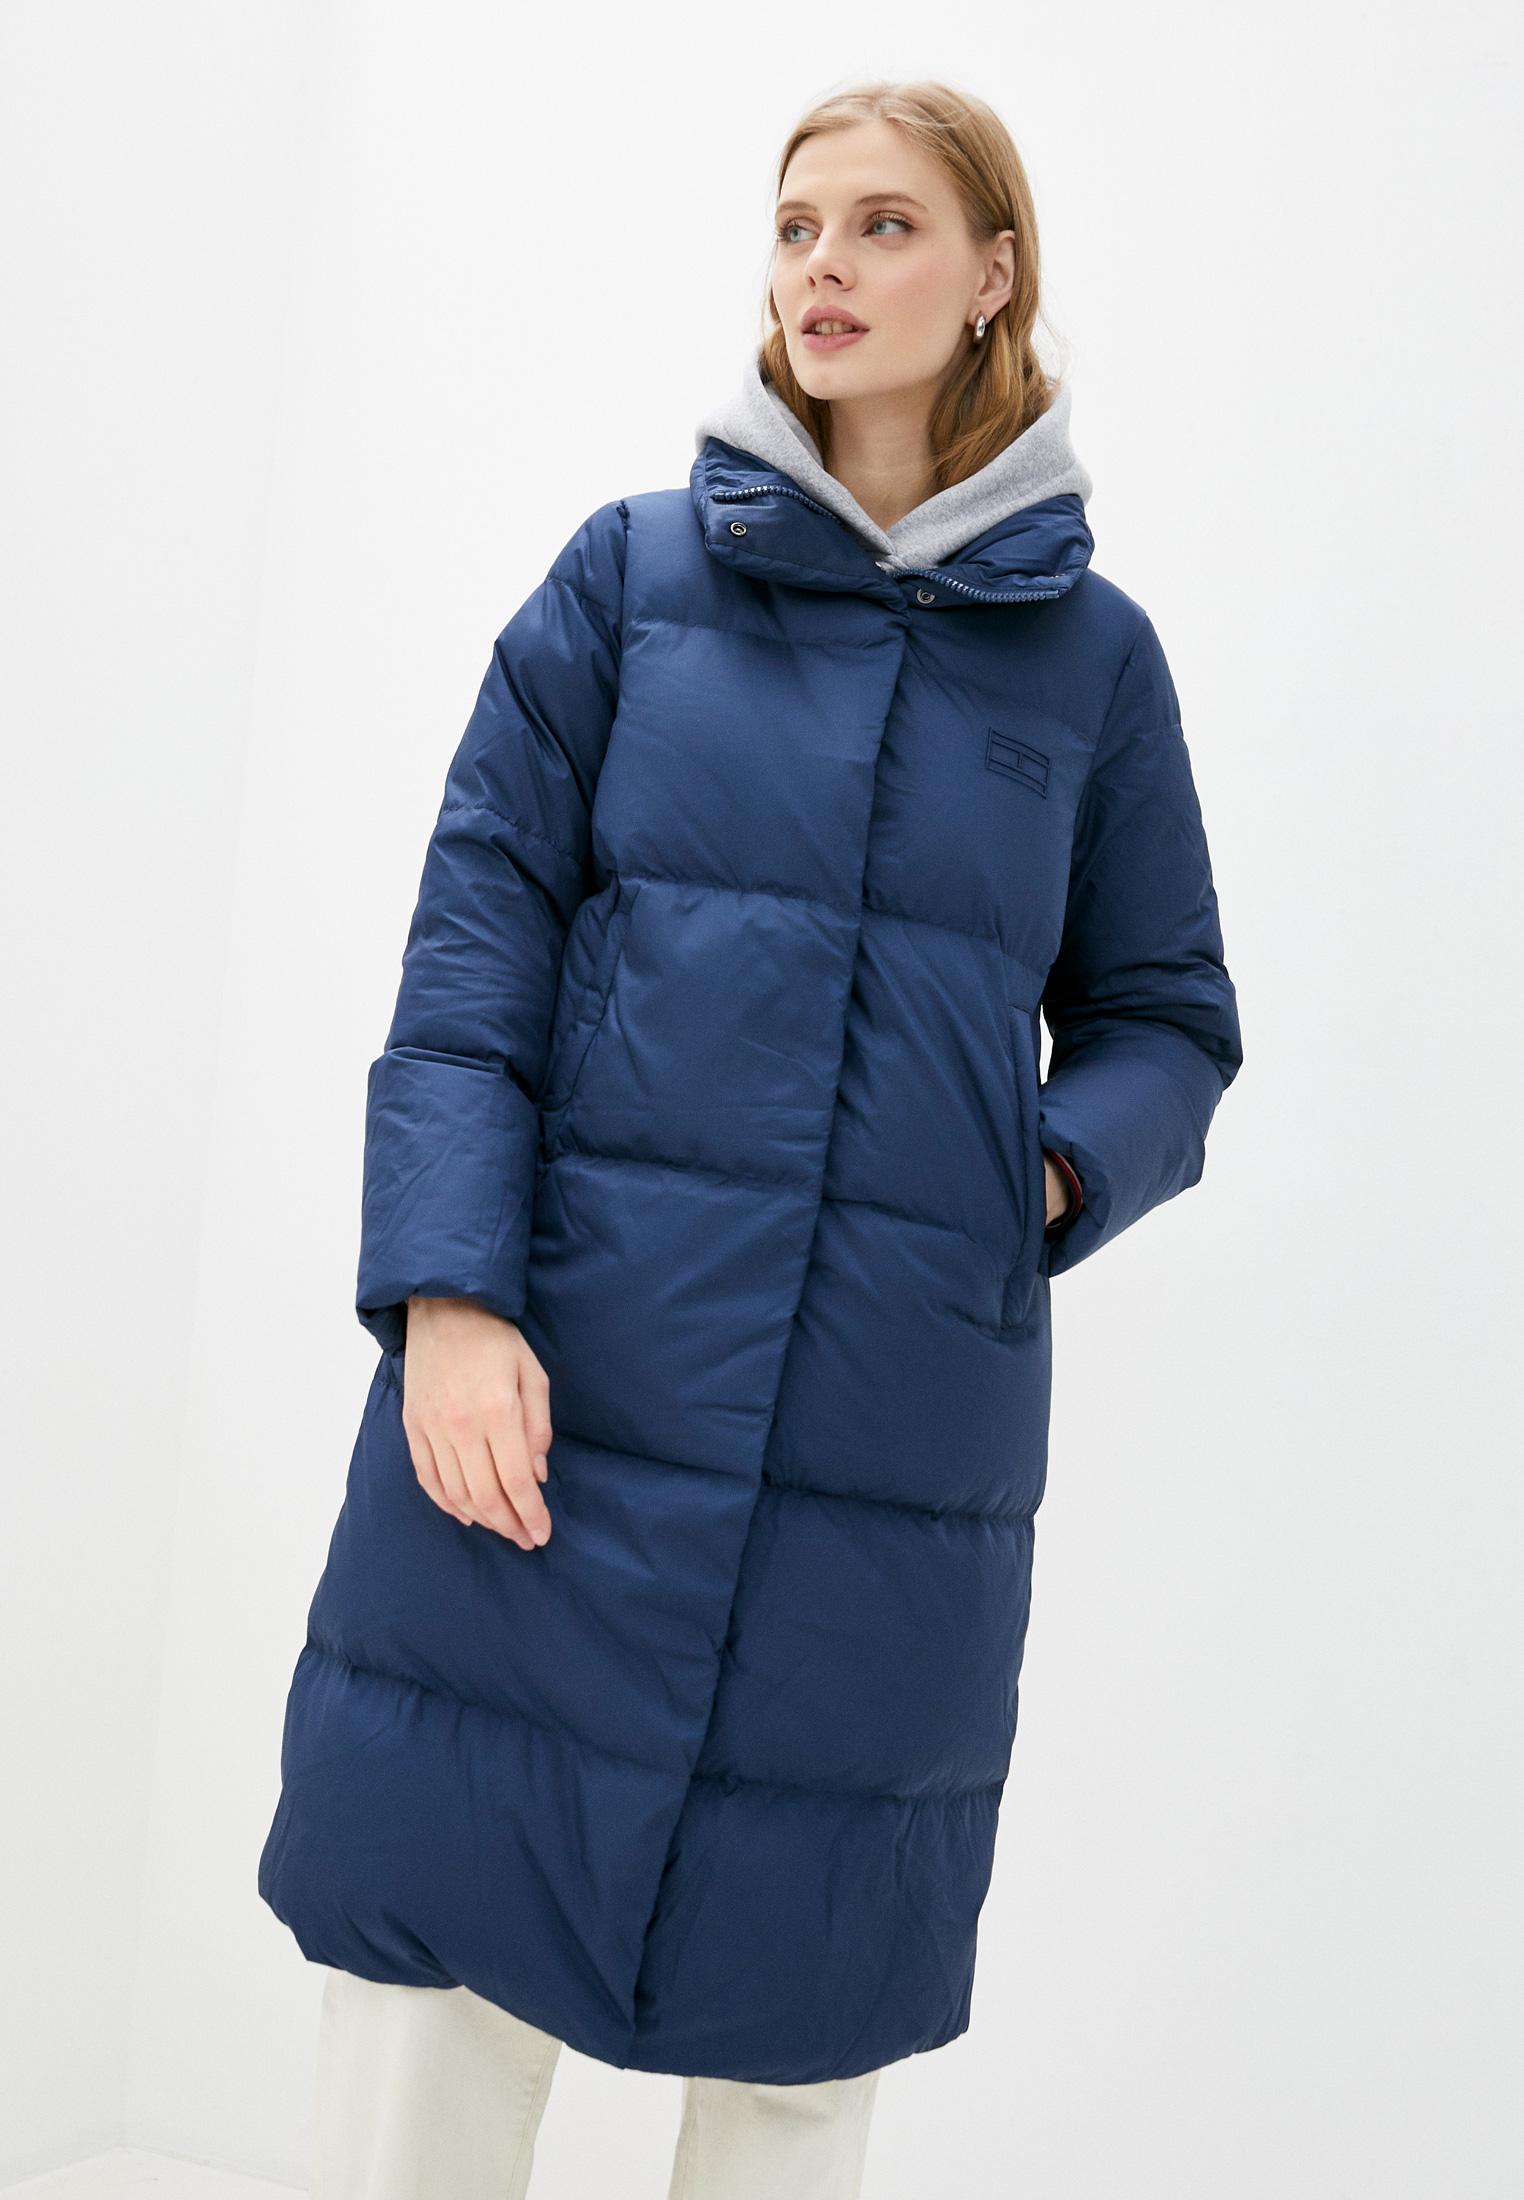 Утепленная куртка Tommy Hilfiger (Томми Хилфигер) WW0WW28637